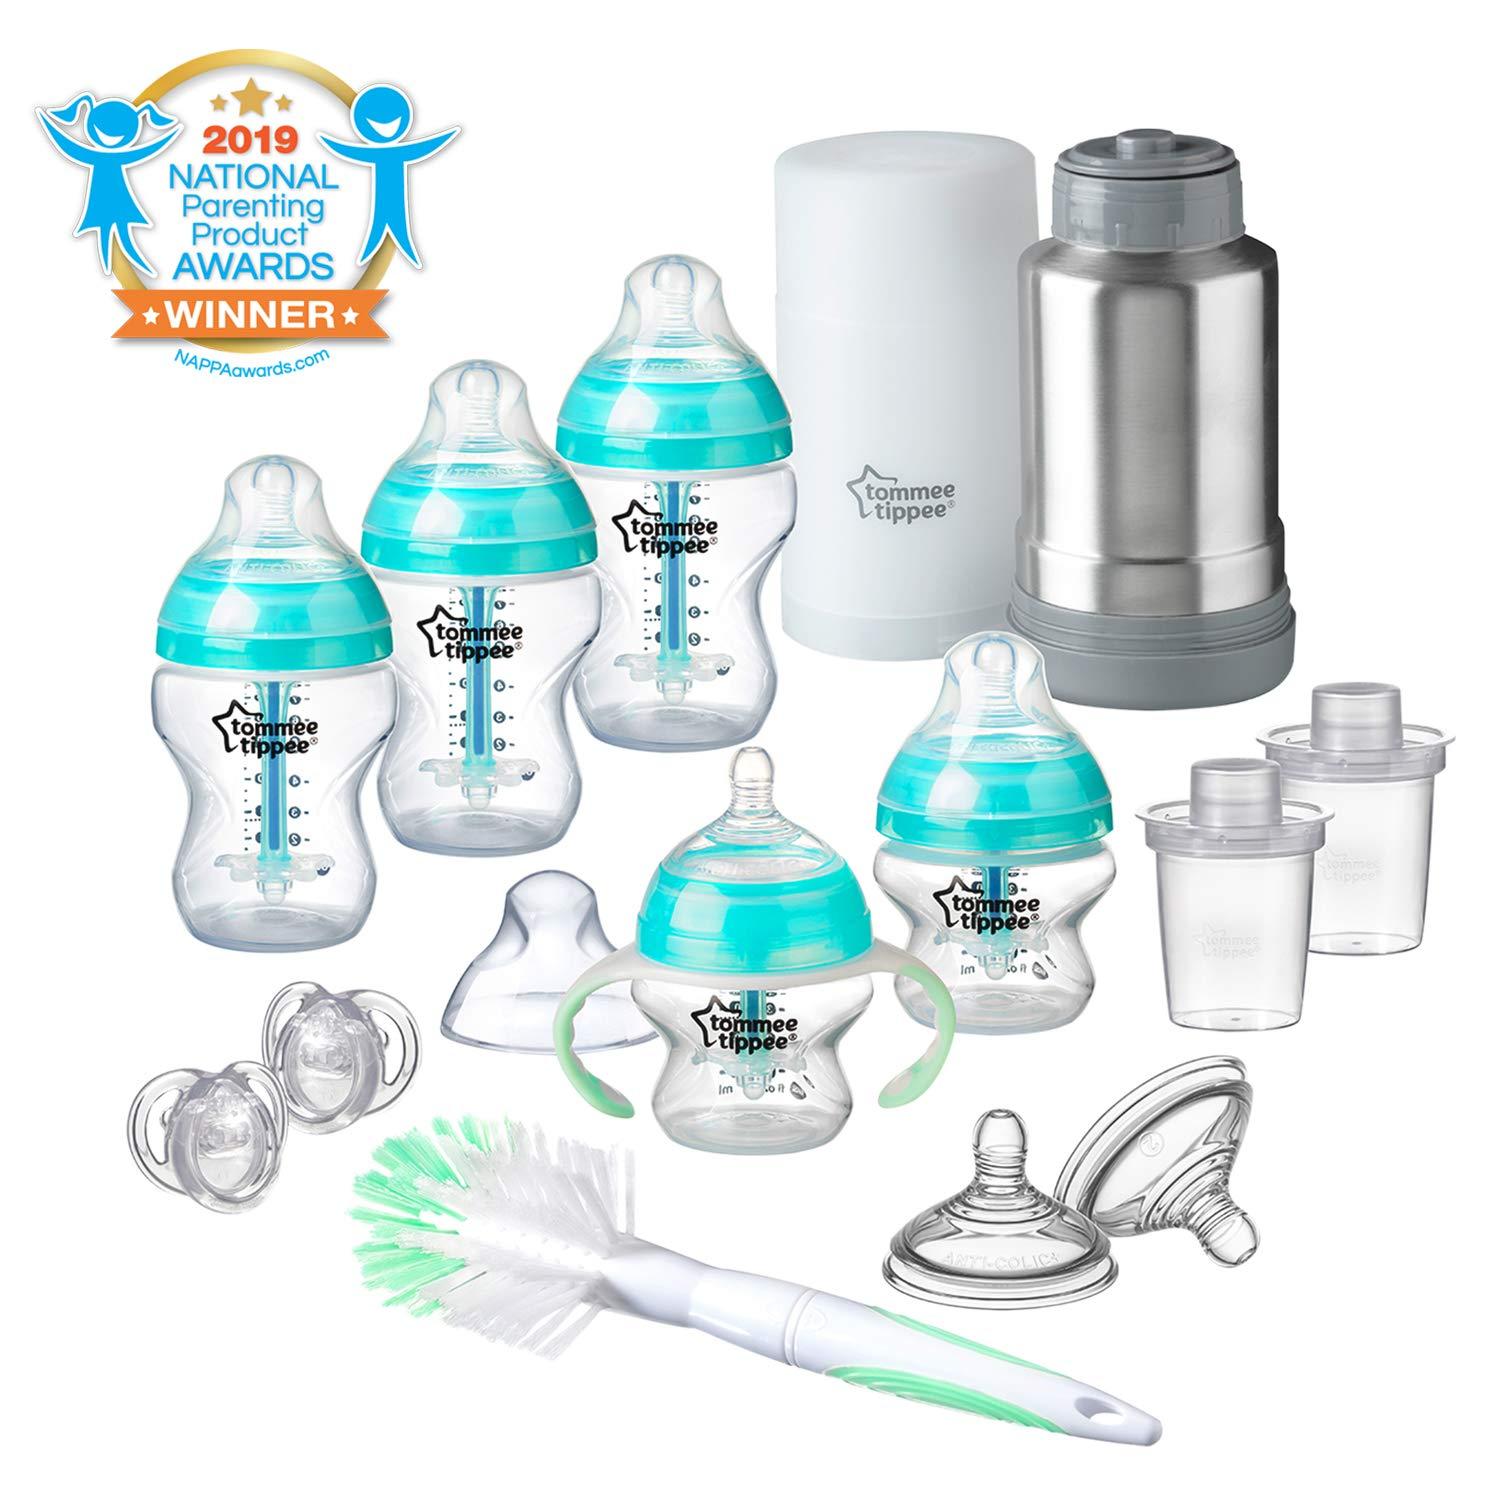 Tommee Tippee Advanced Anti-Colic Newborn Baby Bottle Feeding Gift Set, Heat Sensing Technology, Breast-Like Nipple, BPA-Free